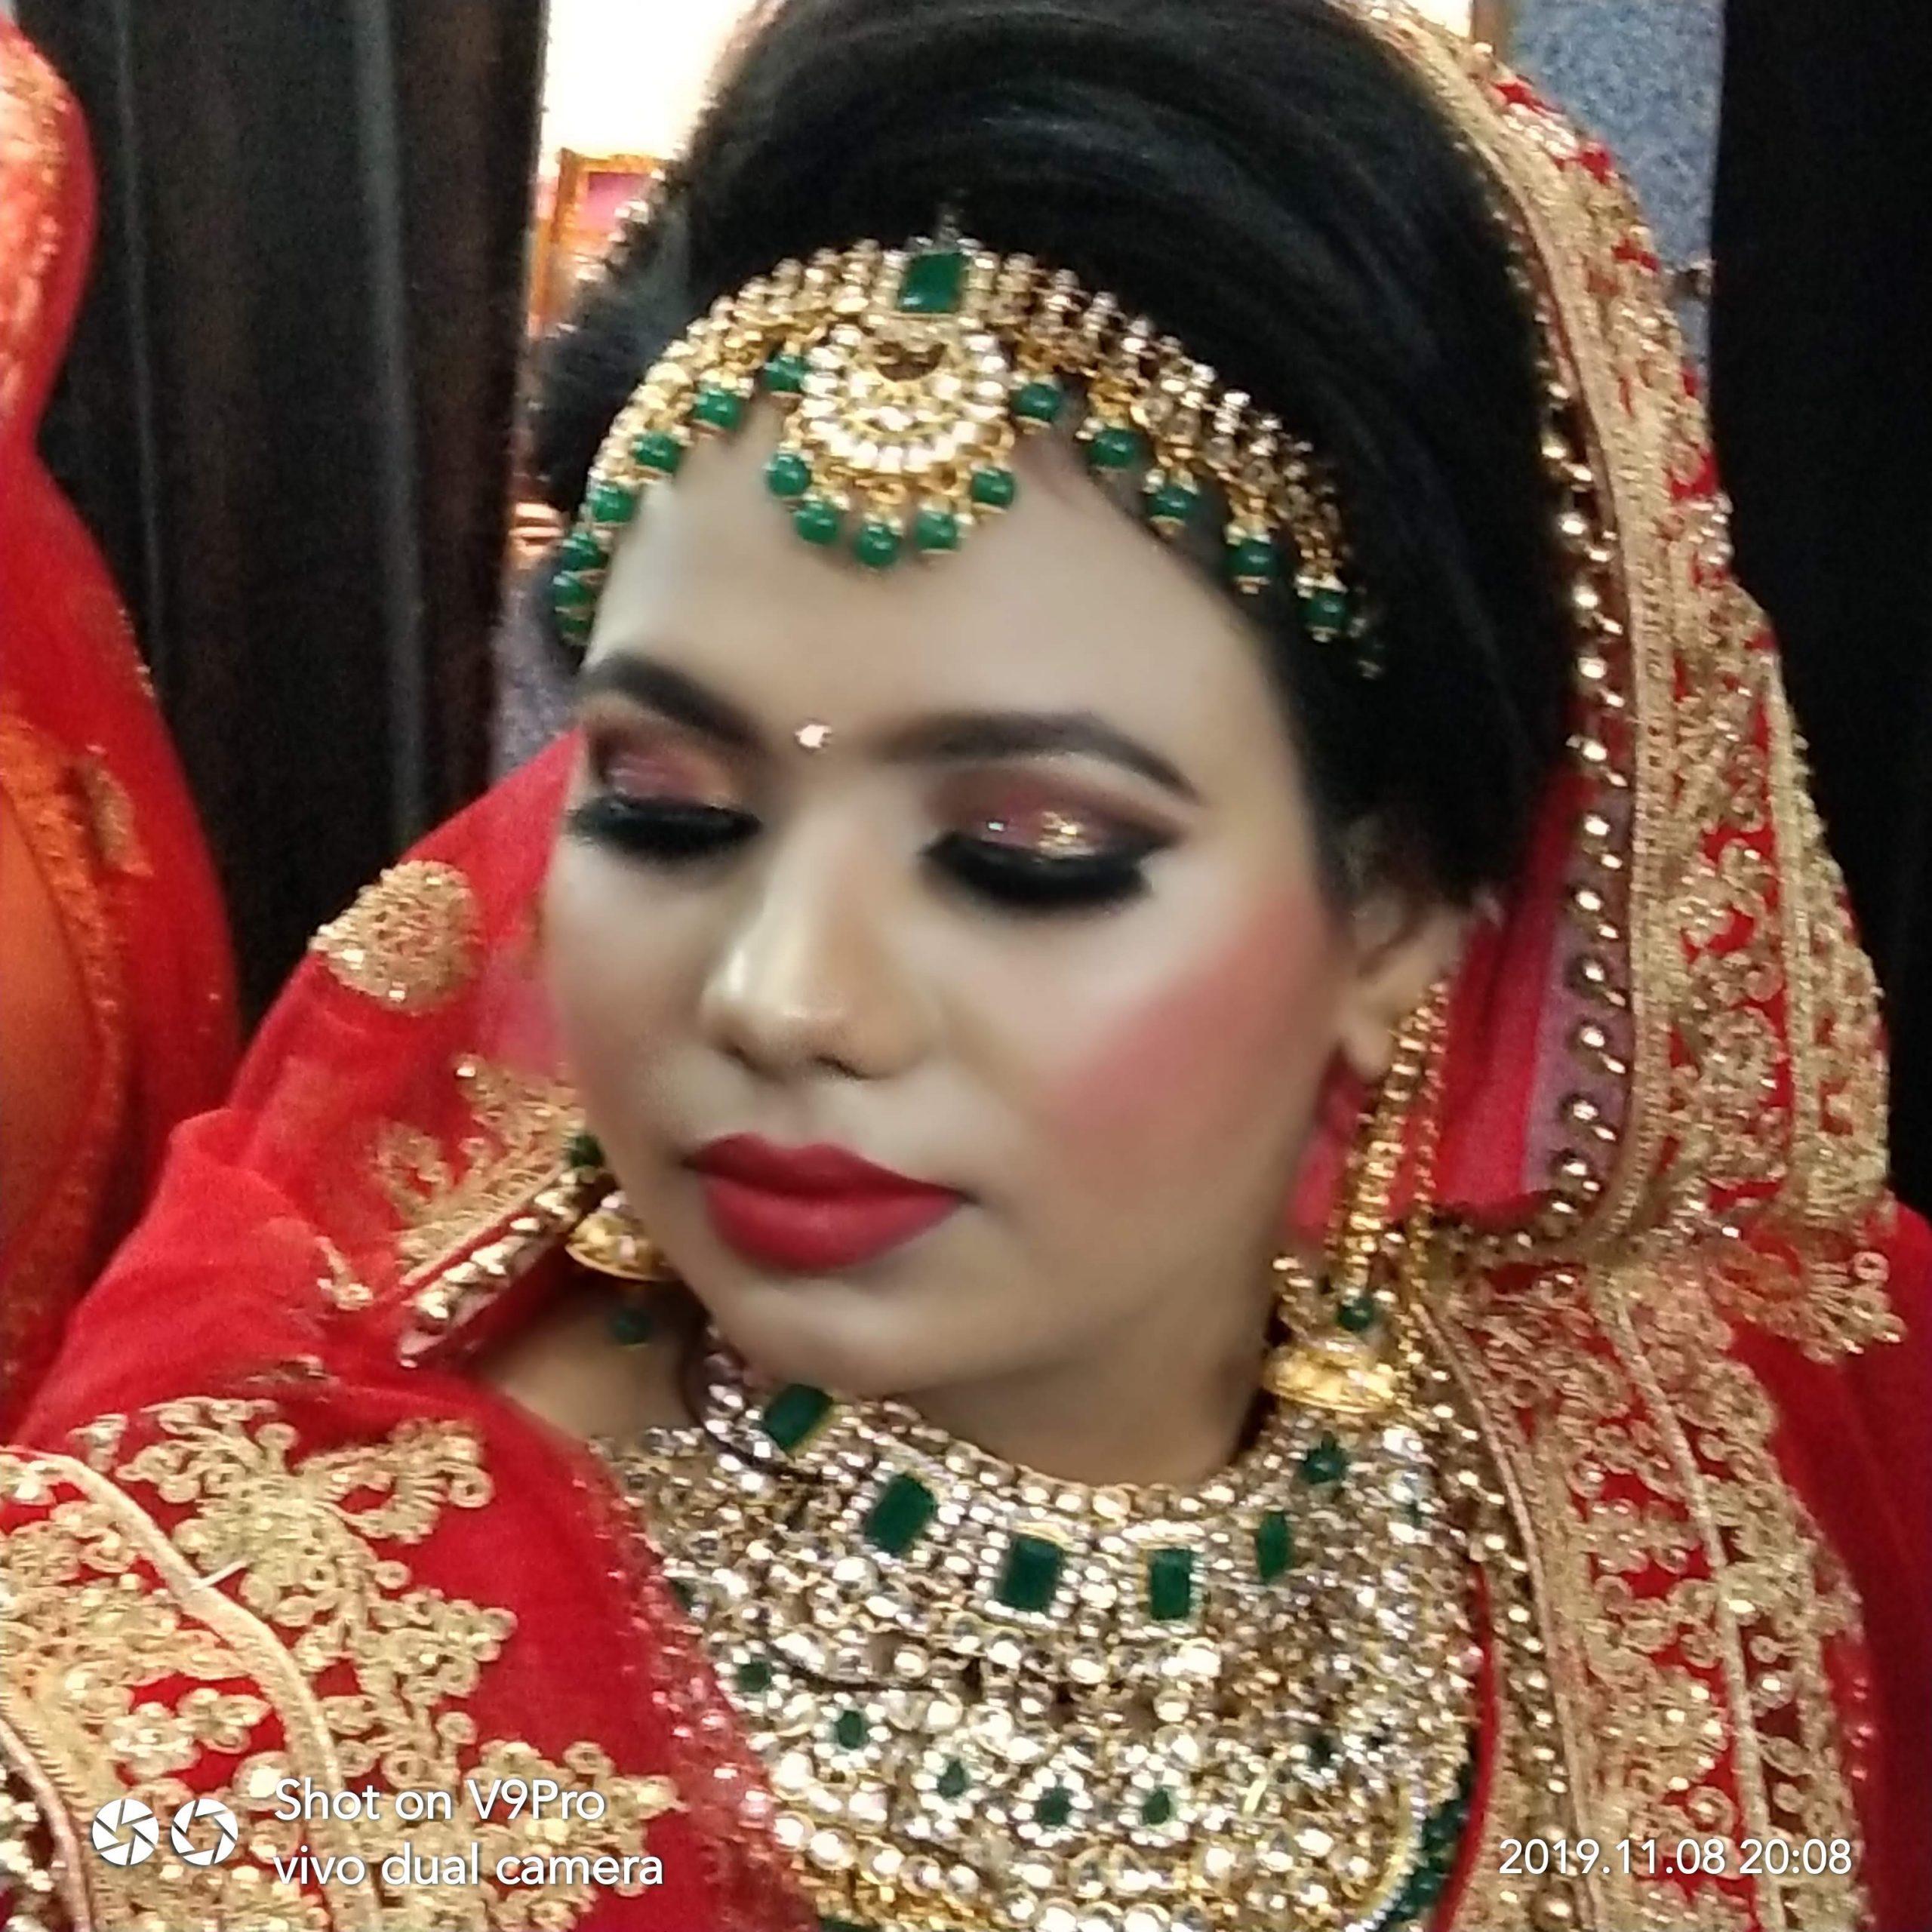 Book bridal makeup artist and parlour at home in delhi ncr India Book bridal makeup artist and parlour at home in canaught place delhi ncr India Book bridal makeup artist and parlour at home in uttam nagar delhi ncr India Book bridal makeup artist and parlour at home in Rajiv chowk delhi ncr India Book bridal makeup artist and parlour at home in Anand vihar delhi ncr India Book bridal makeup artist and parlour at home in kaushambi delhi ncr India Book bridal makeup artist and parlour at home in vikas puri delhi ncr India Book bridal makeup artist and parlour at home in janak puri delhi ncr India Book bridal makeup artist and parlour at home in dwarka delhi ncr India Book bridal makeup artist and parlour at home in delhi kamla nagar ncr India Book bridal makeup artist and parlour at home in lajpat nagar delhi ncr India Book bridal makeup artist and parlour at home in punjabi bagh delhi ncr India Book bridal makeup artist and parlour at home in rajouri garden delhi ncr India Book bridal makeup artist and parlour at home in delhi ncr noida India Book bridal makeup artist and parlour at home in delhi ncr greater noida India Book bridal makeup artist and parlour at home in delhi ncr gajipur India Book bridal makeup artist and parlour at home in delhi ncr faridabad India Book bridal makeup artist and parlour at home in delhi ncr gaur city India Book bridal makeup artist and parlour at home in delhi ncr ghaziabad India Book bridal makeup artist and parlour at home in nawada delhi ncr India Book bridal makeup artist and parlour at home in bindapur delhi ncr India Book bridal makeup artist and parlour at home in sitapuri delhi ncr India Book bridal makeup artist and parlour at home in Laxmi nagar delhi ncr India Book bridal makeup artist and parlour at home in okhla delhi ncr India Book bridal makeup artist and parlour at home in saket delhi ncr India Book bridal makeup artist and parlour at home in delhi ncr gurugram India Book bridal makeup artist and parlour at home in de